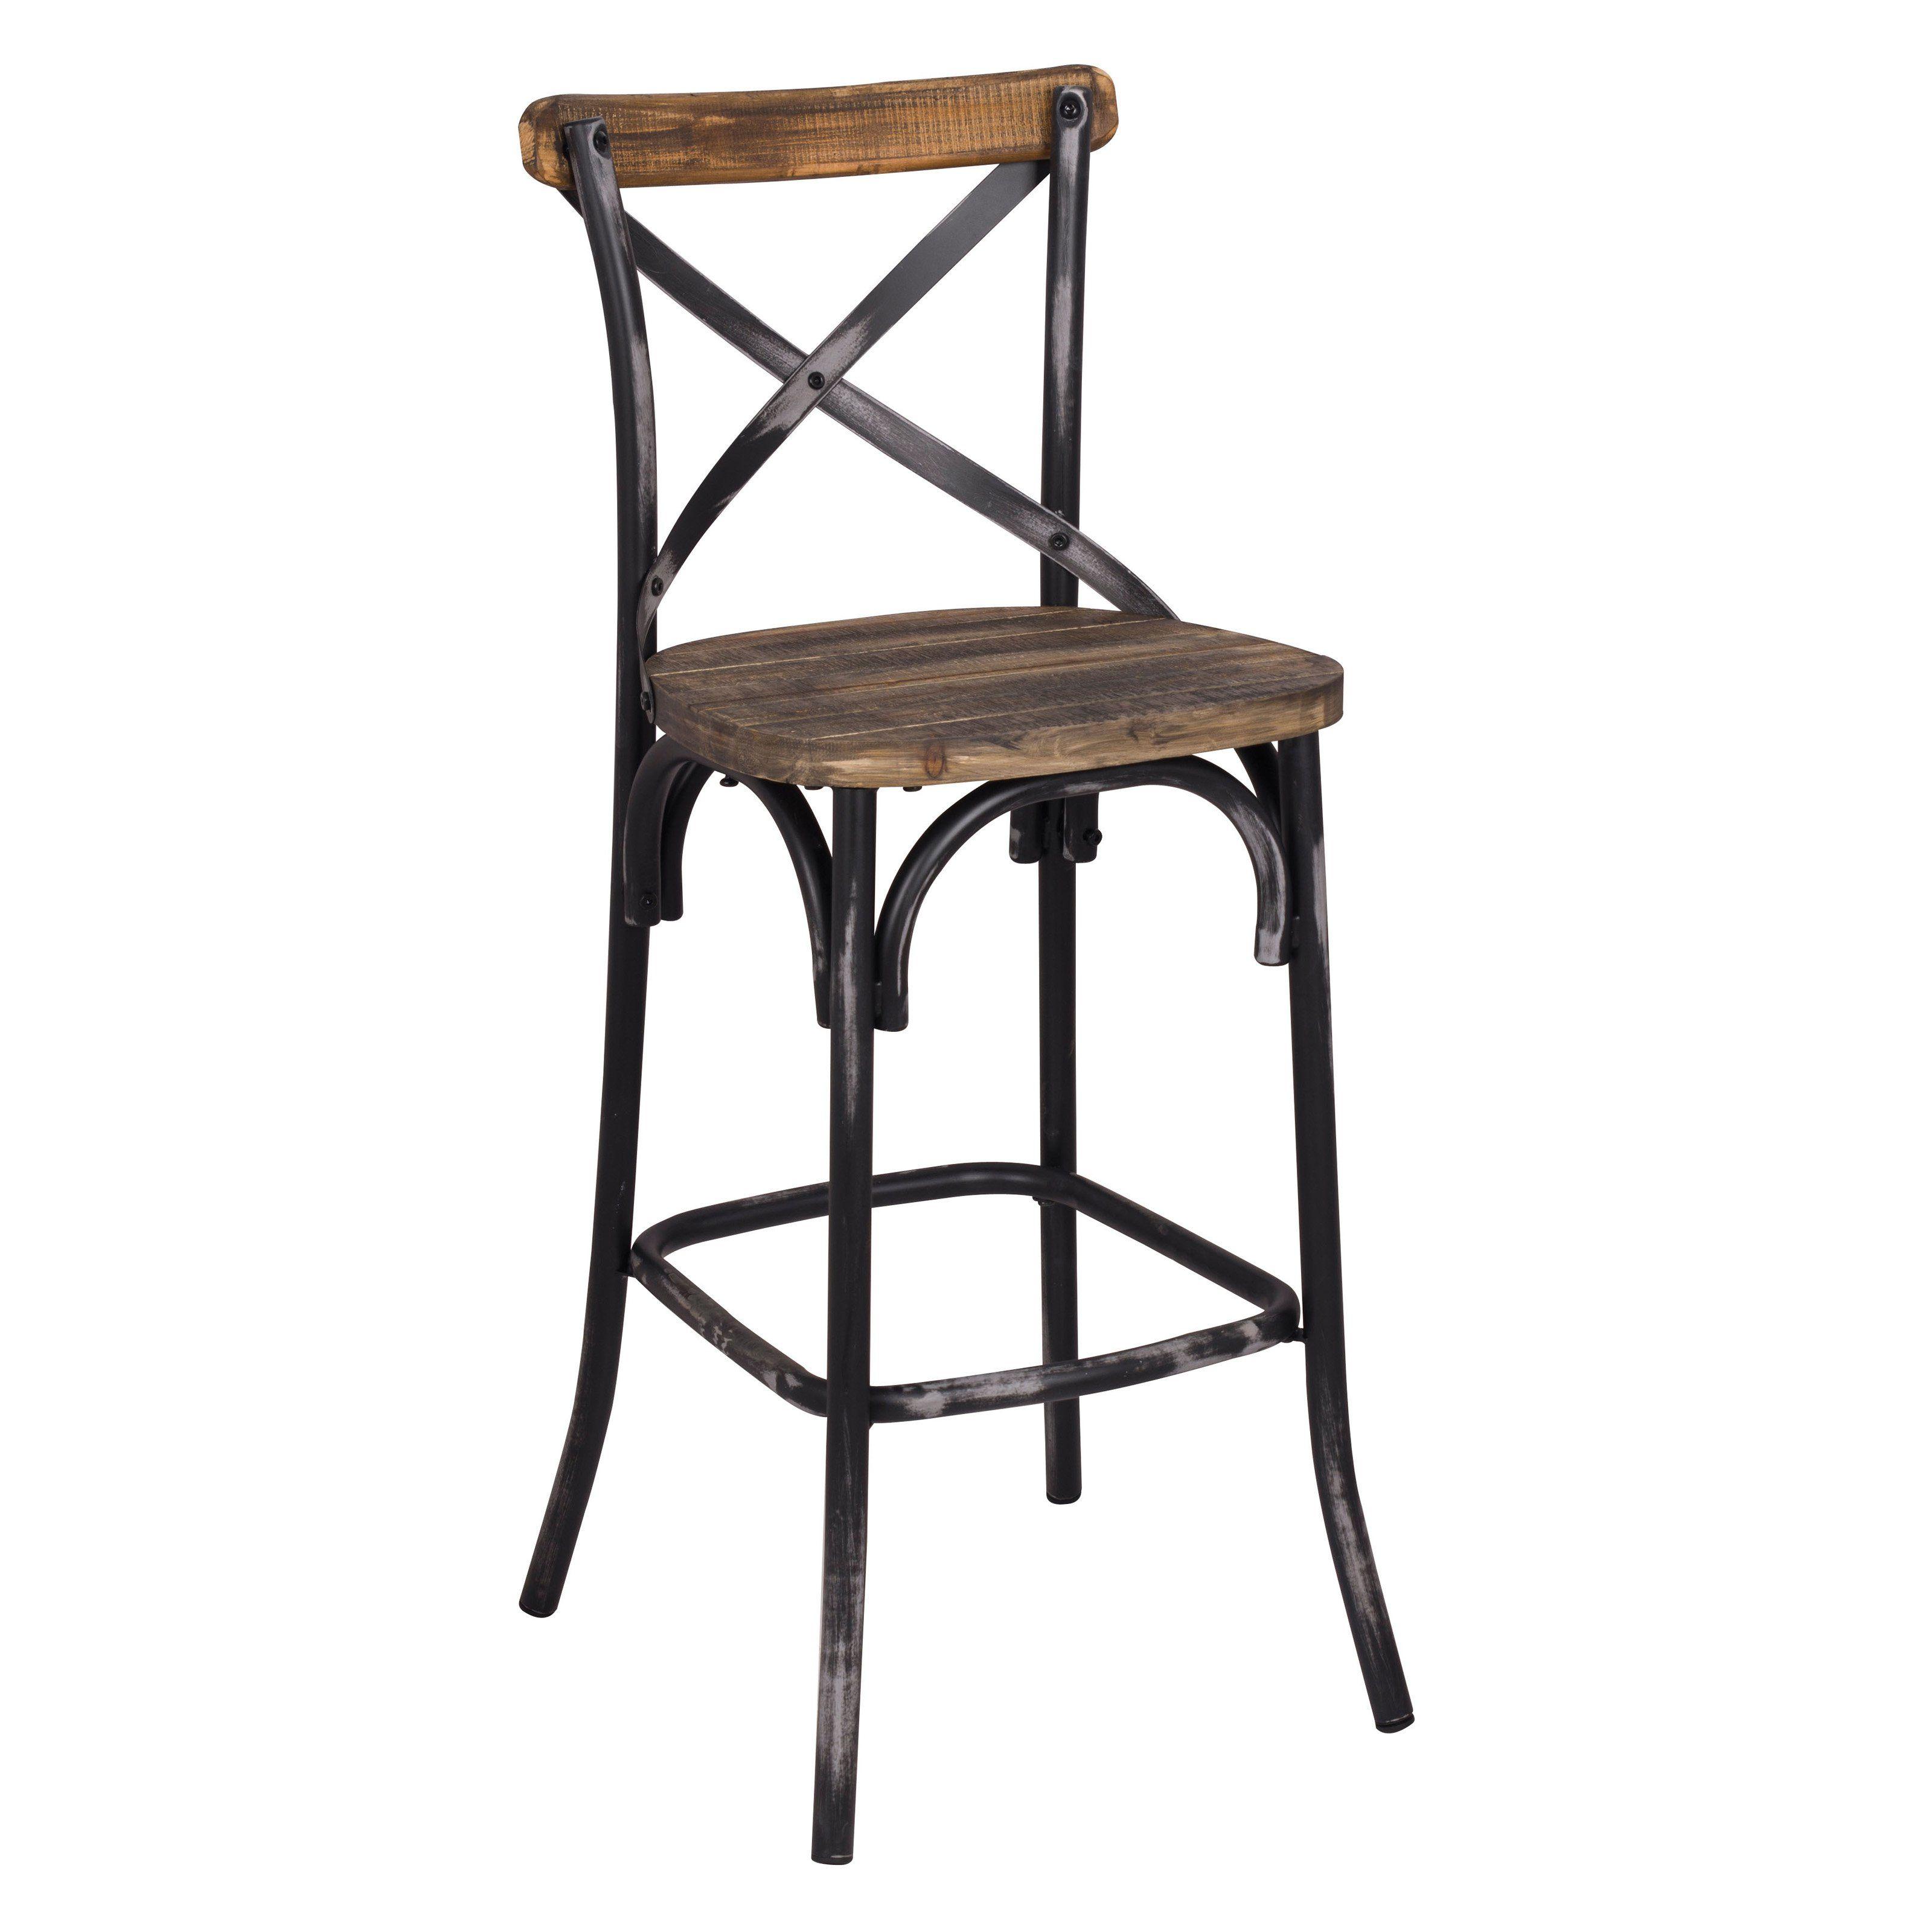 Acme Furniture Zaire Bar Stool Rustic Bar Stools Bar Chairs